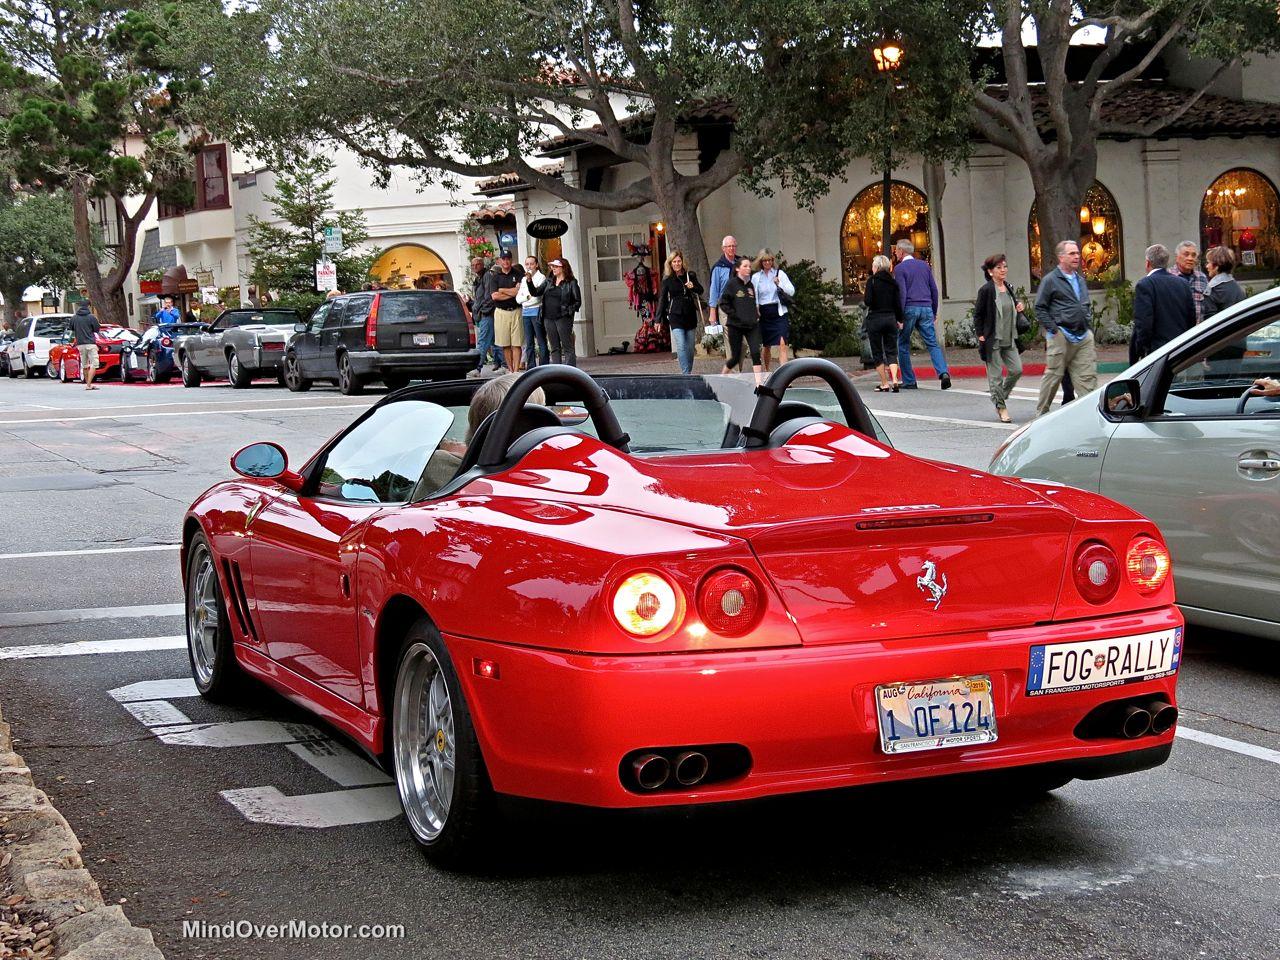 Ferrari 550 Barchetta in Carmel CA